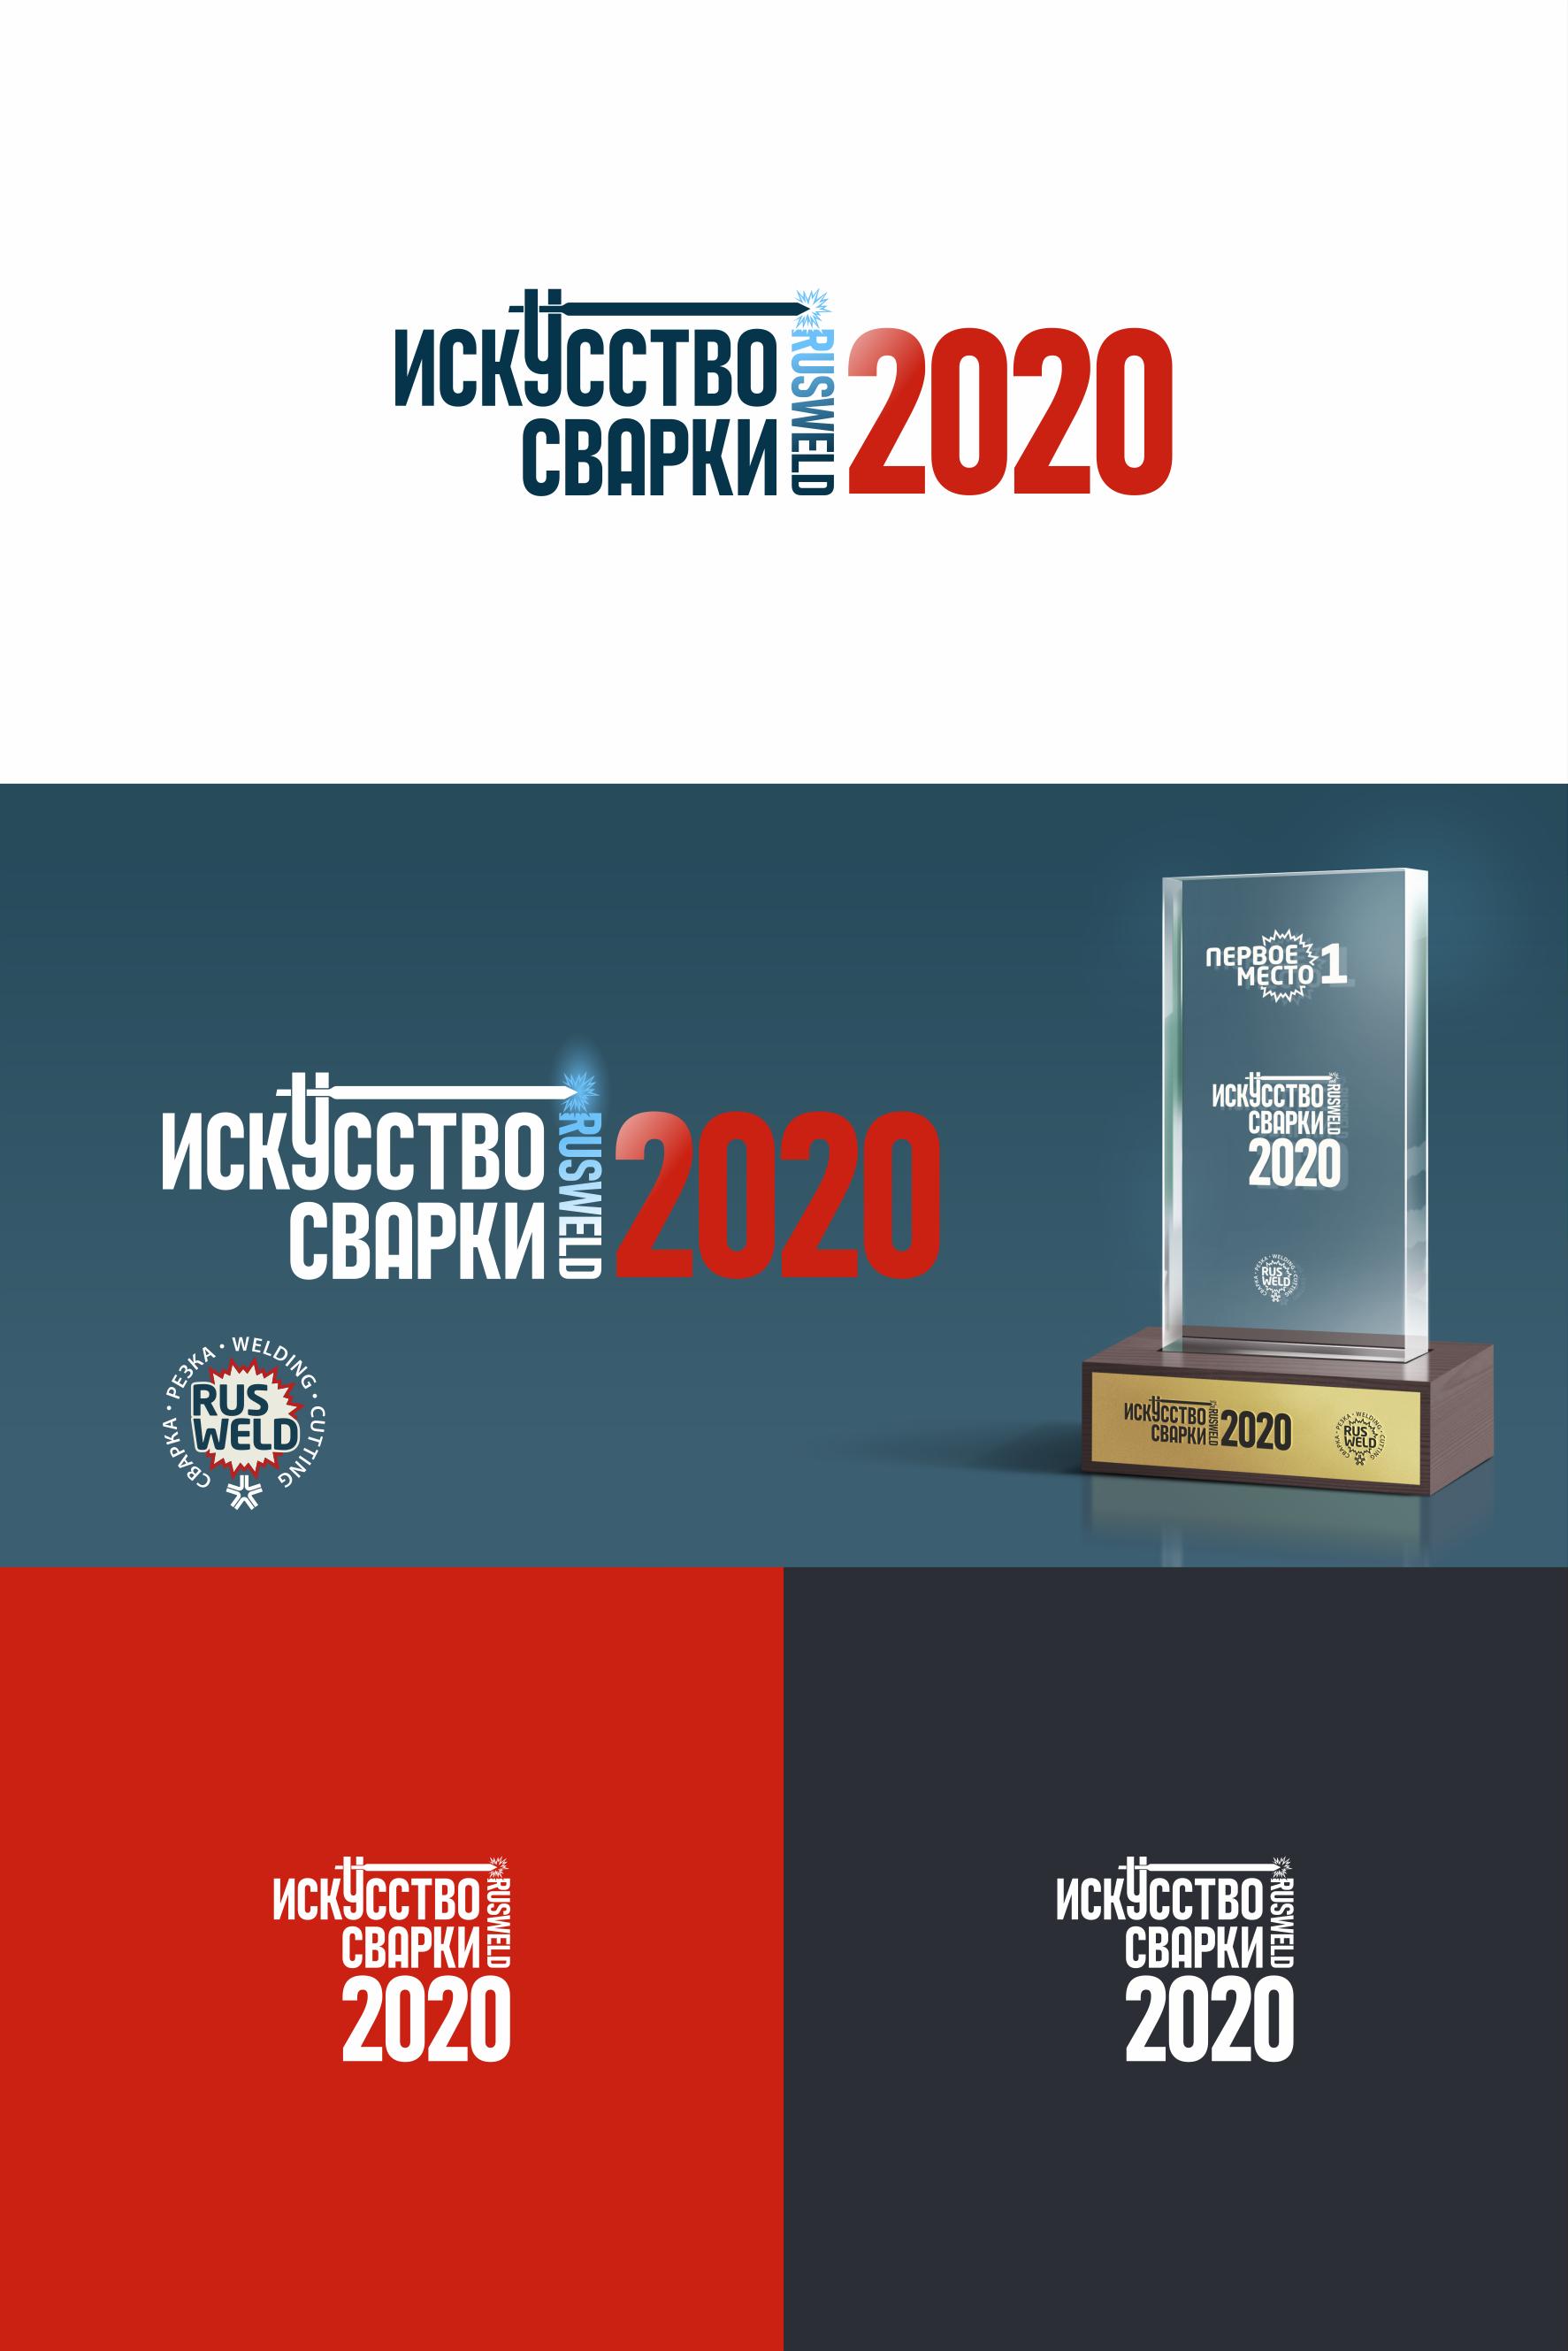 Разработка логотипа для Конкурса фото f_5345f6de9756ca74.png